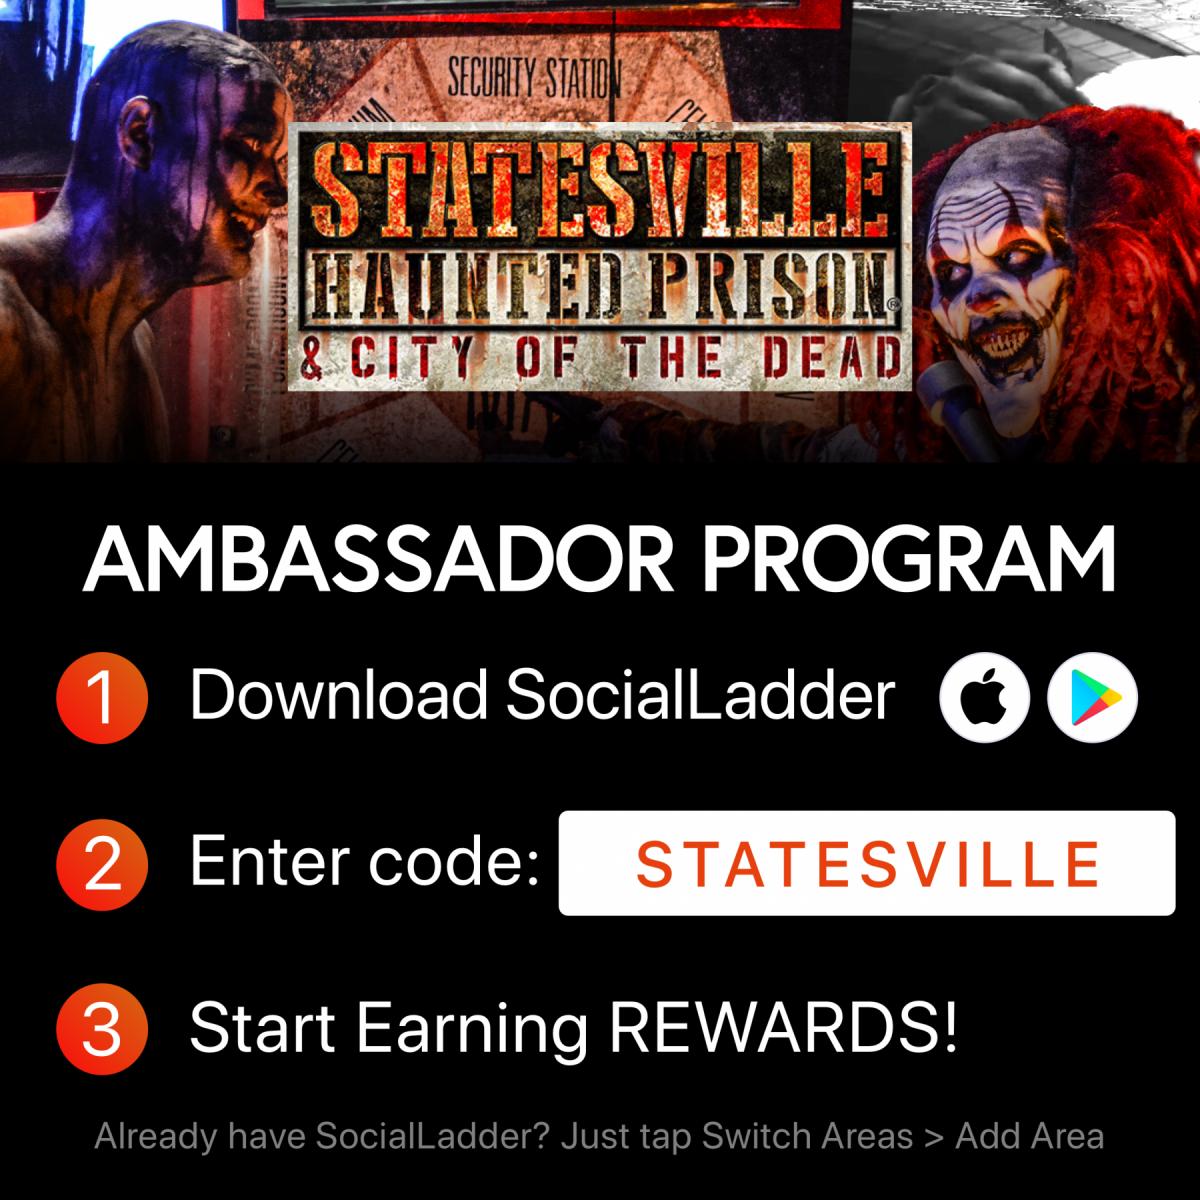 Statesville SocialLadder